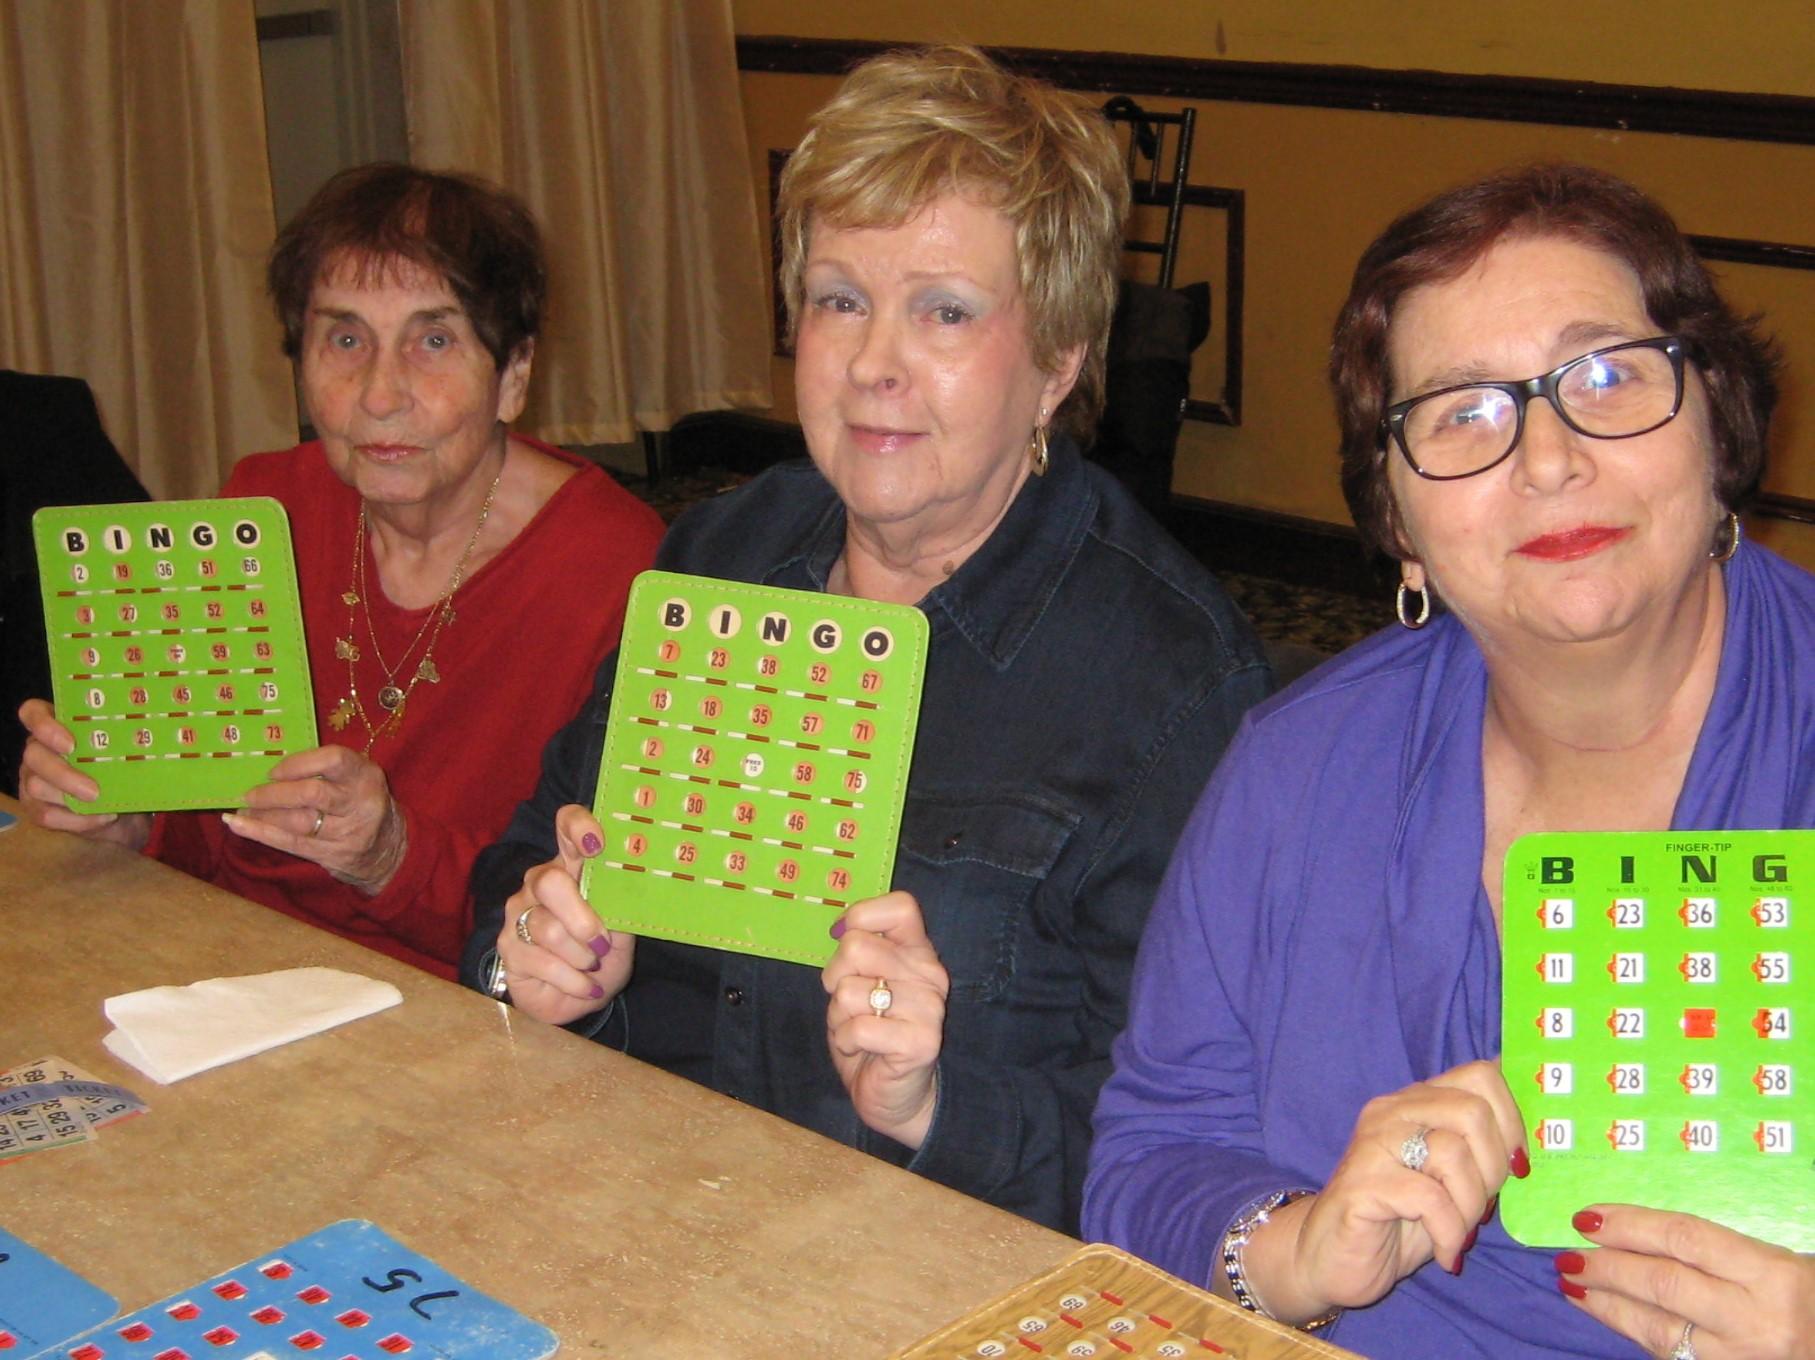 Bingo players 2016